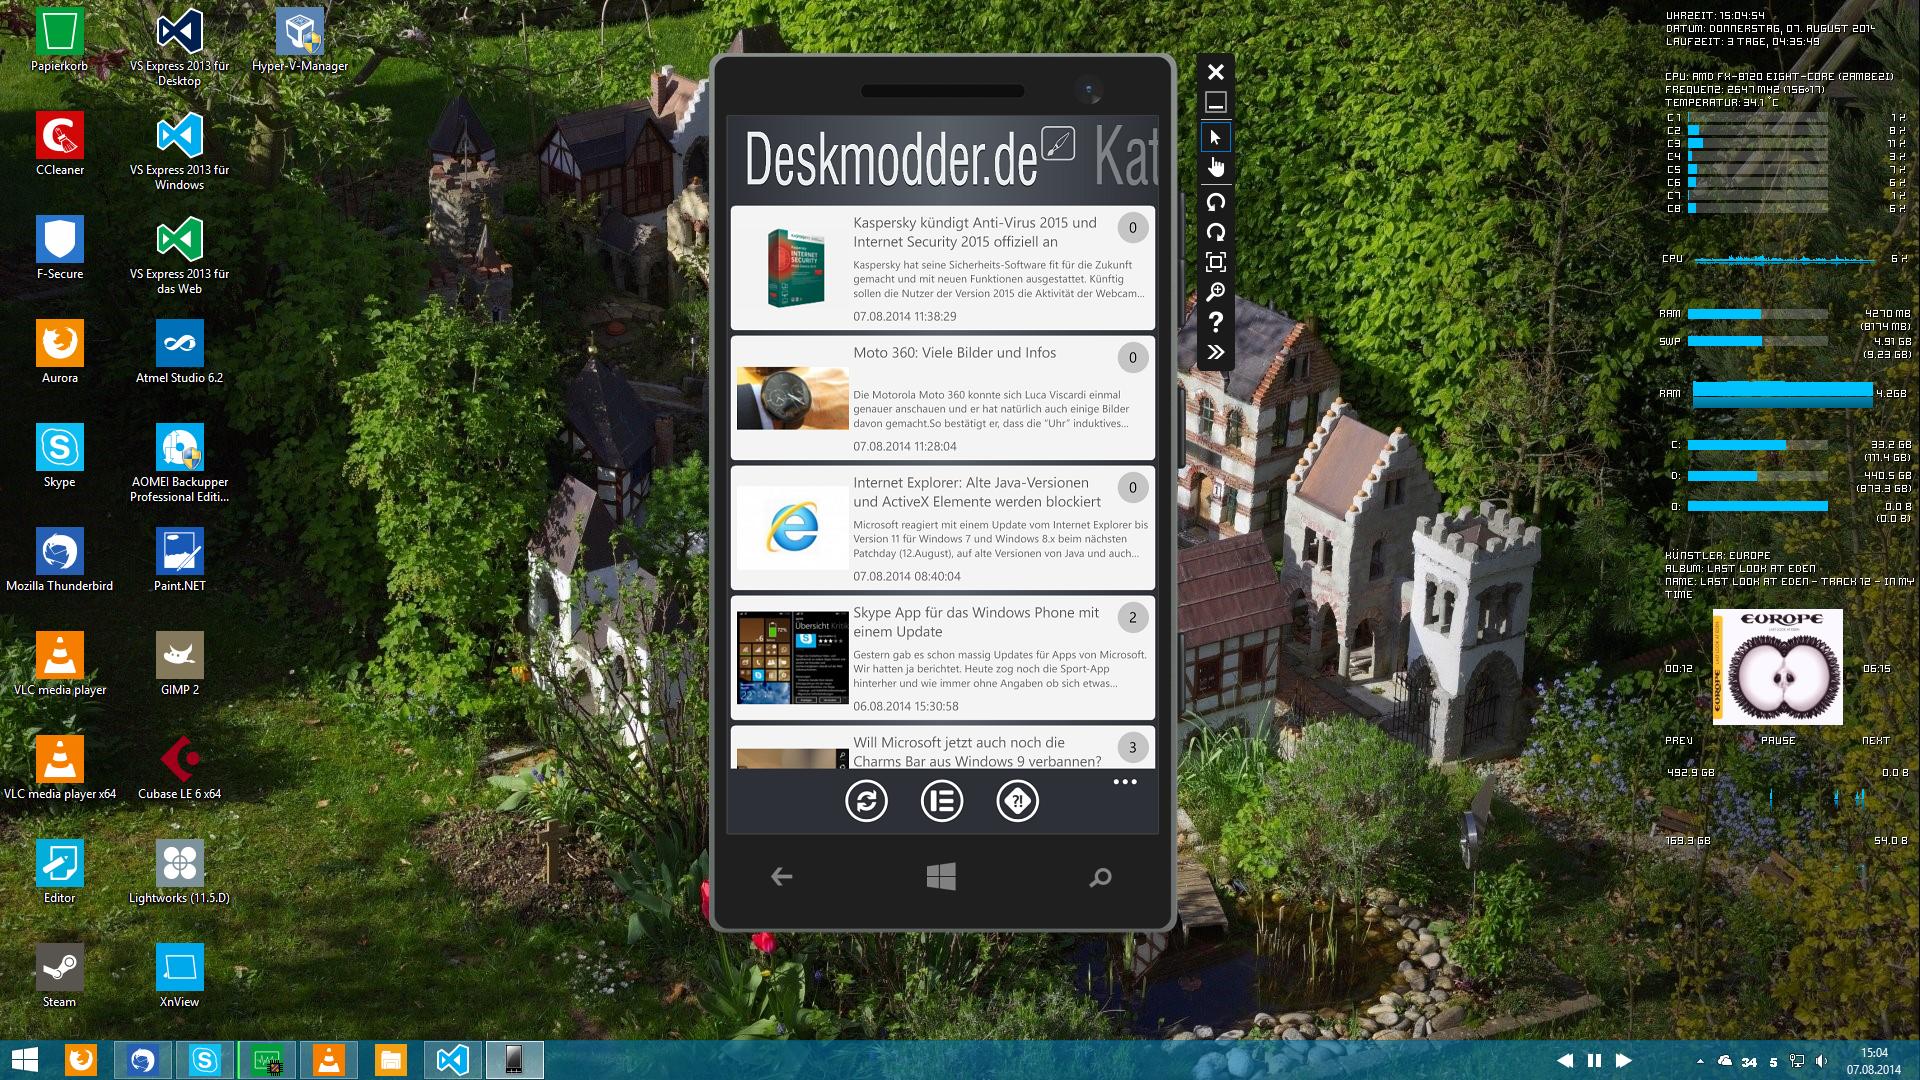 Deskmodder.de-App für Windows Phone verfügbar